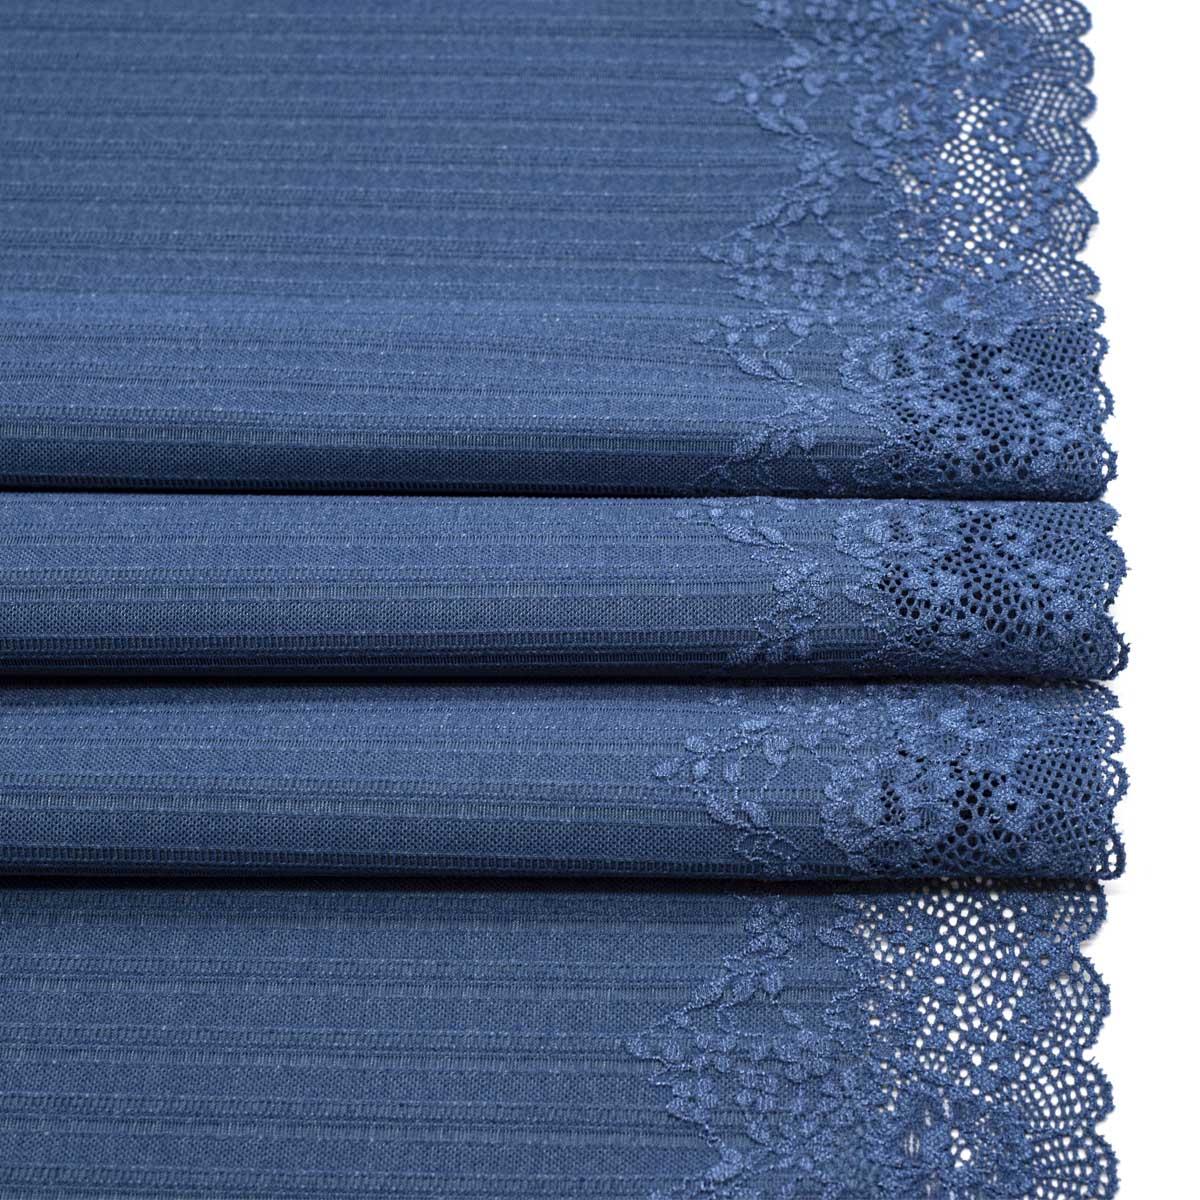 SU-05 Ткань эластичная бельевая 44,5 см*10 м, синий